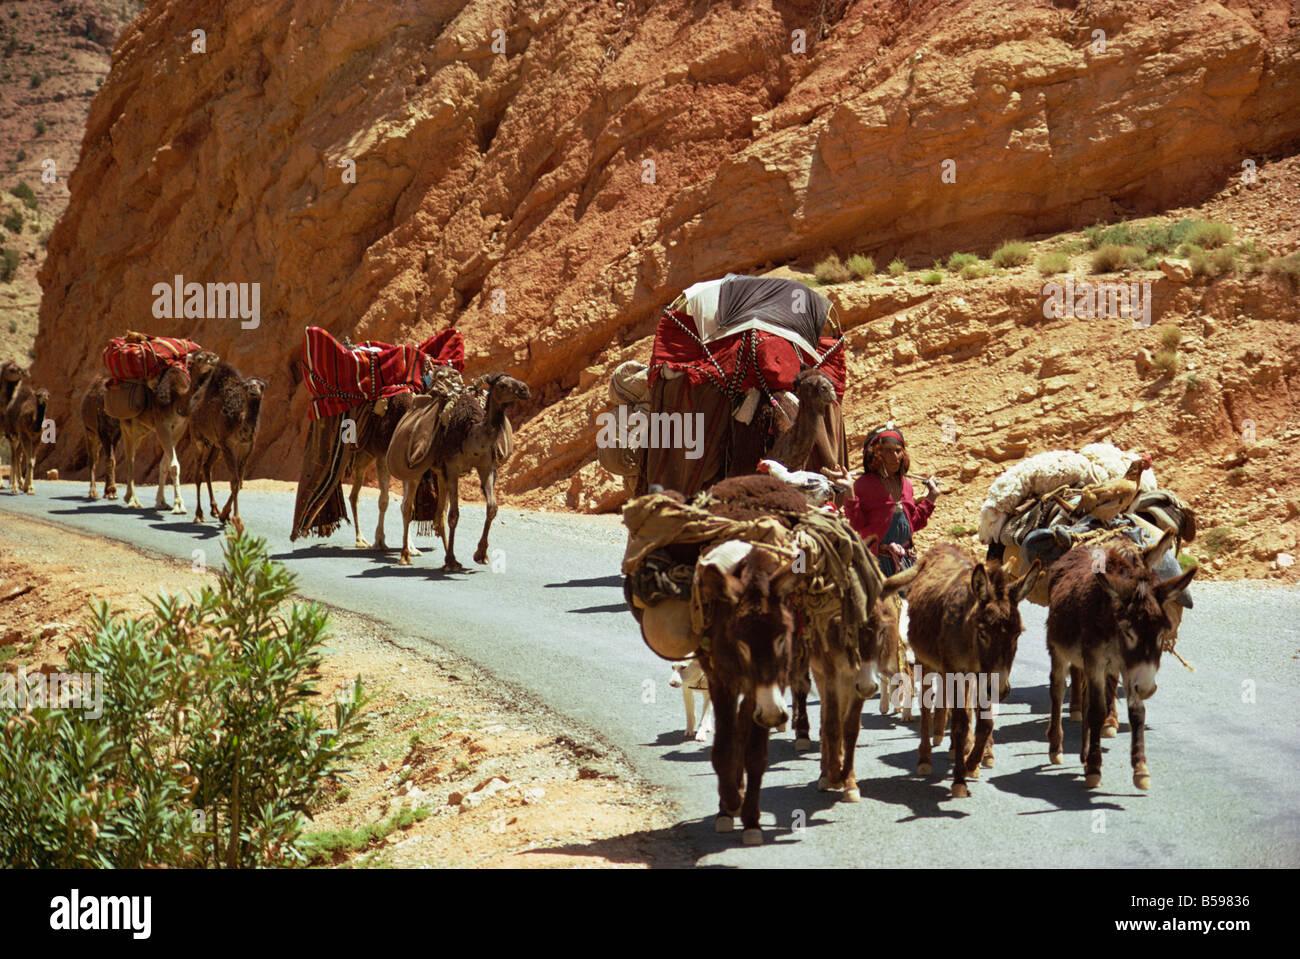 Oued Abiod Gorge, Aures montagne, Algeria, Africa Settentrionale, Africa Immagini Stock